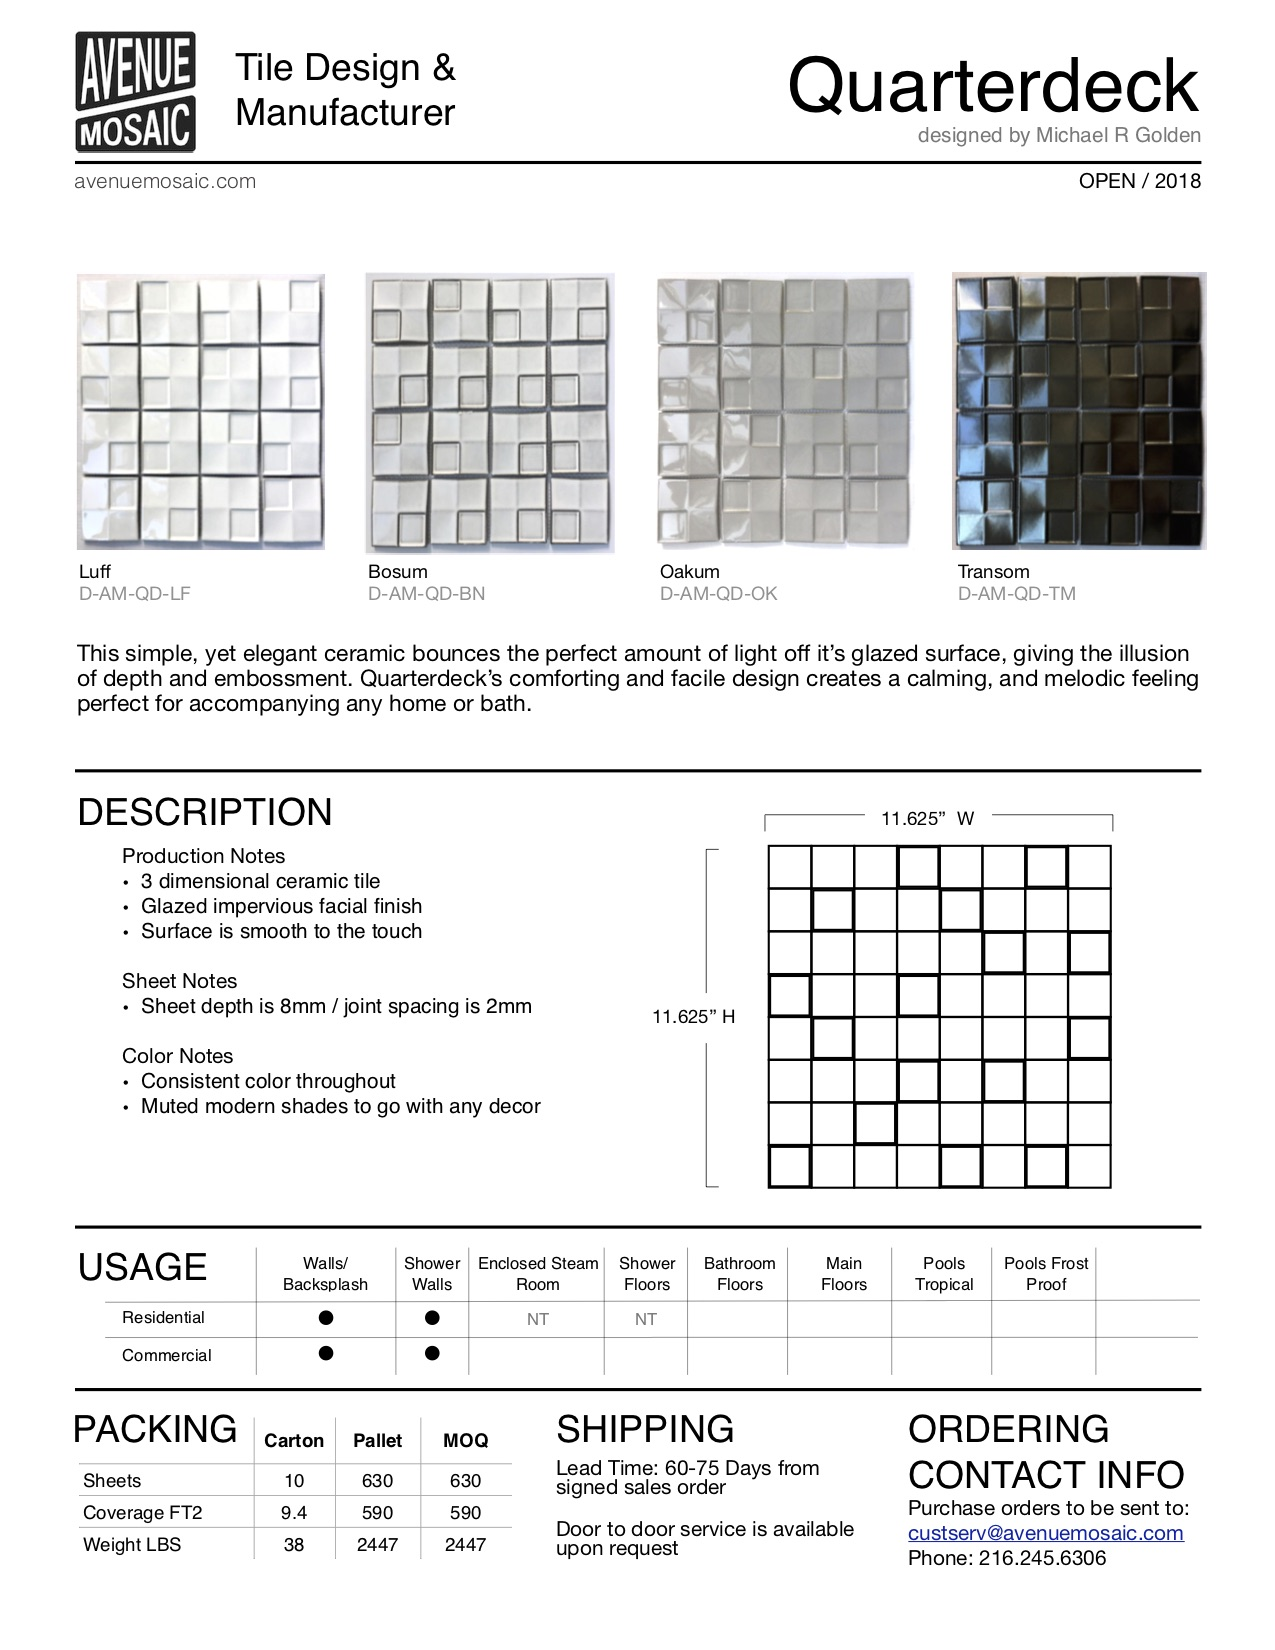 Quarterdeck.pdf